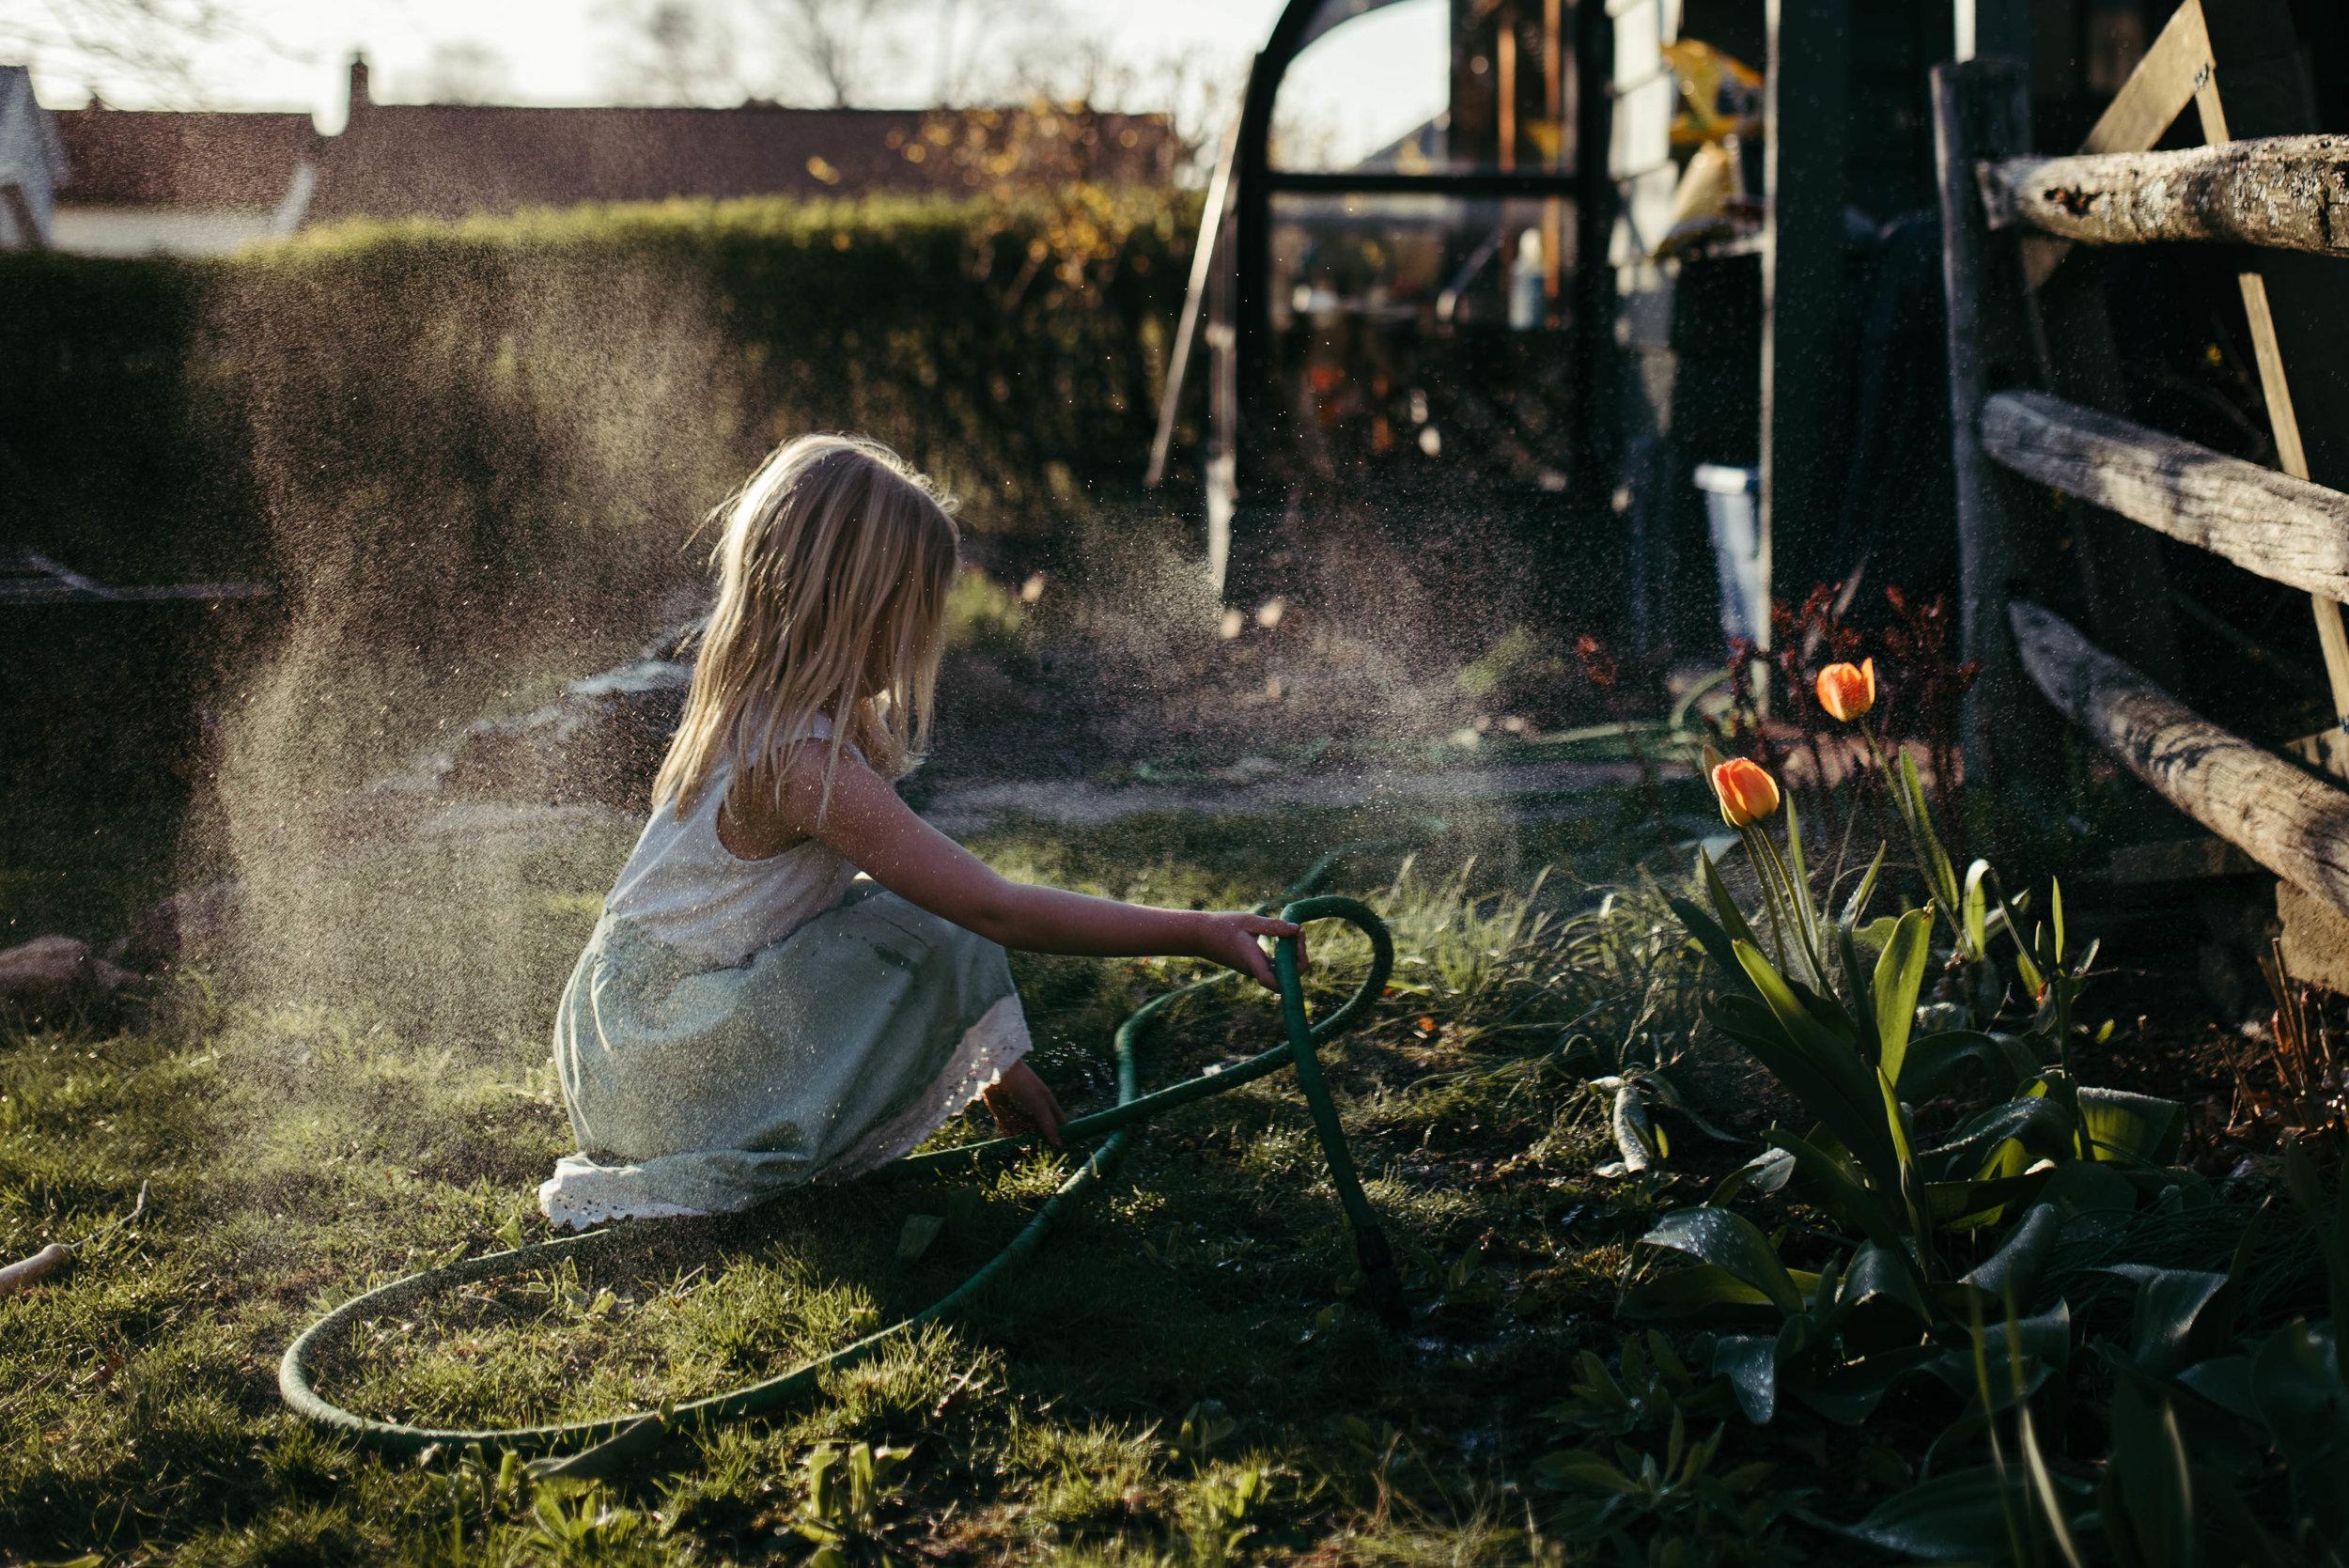 lifestyle photographer pittsburgh-17.jpg